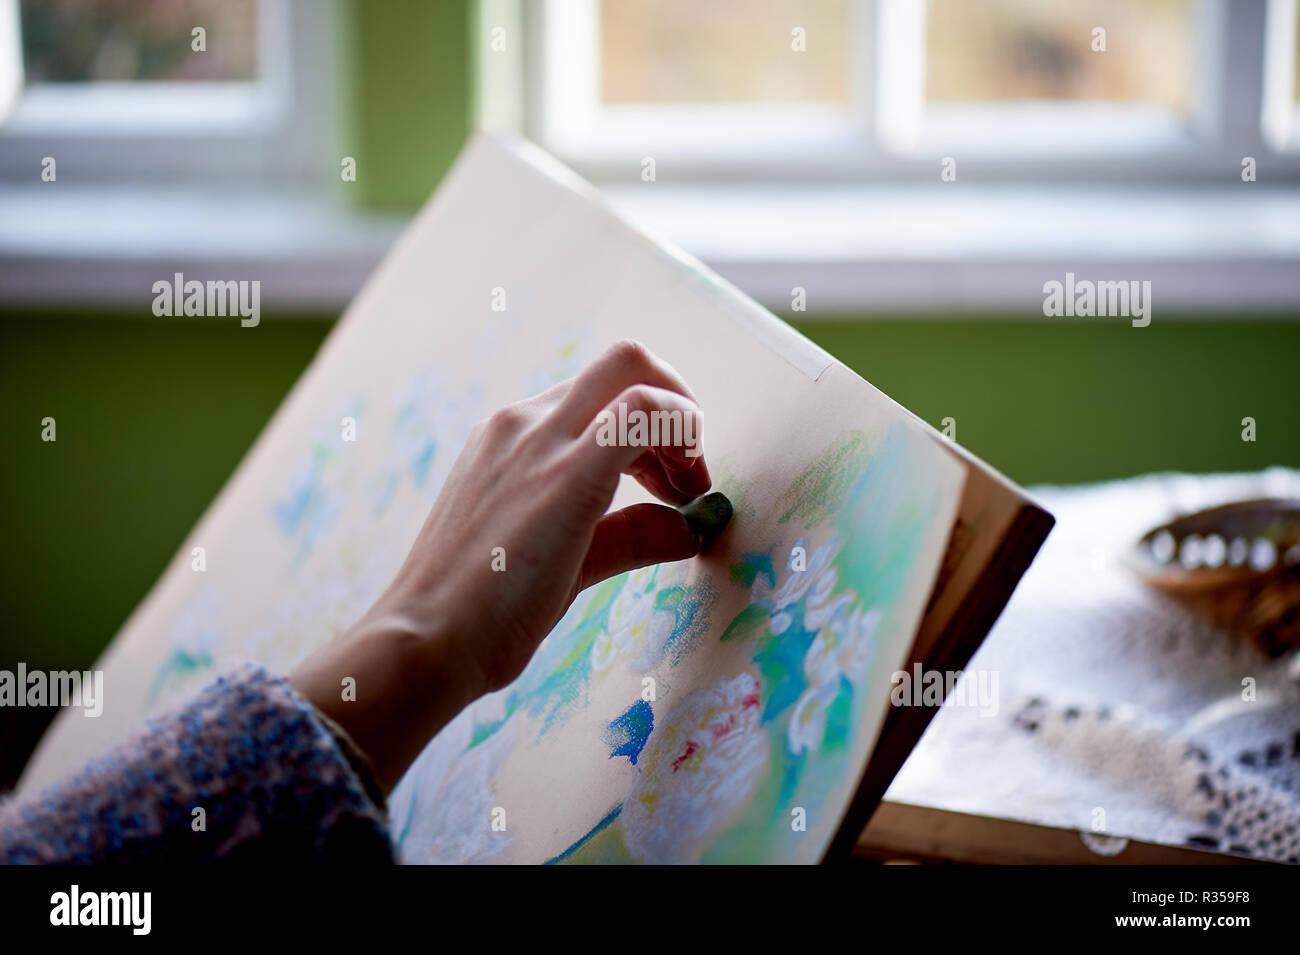 Der Künstler malt mit trockener pastell. den kreativen Prozess des Malens. Stockbild